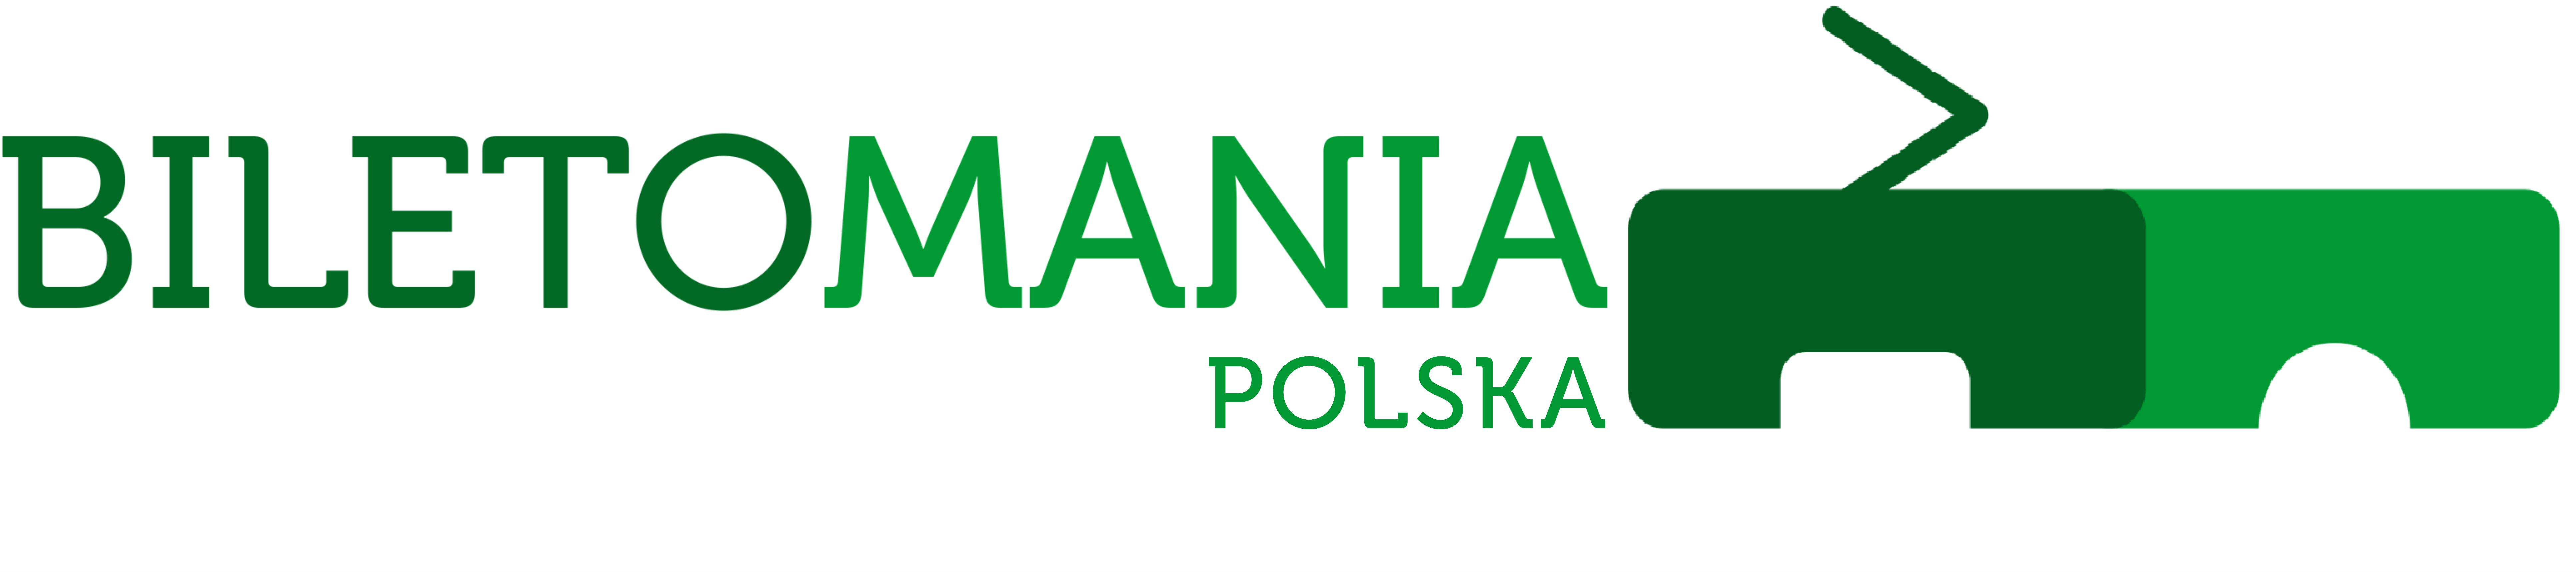 Biletomania Polska